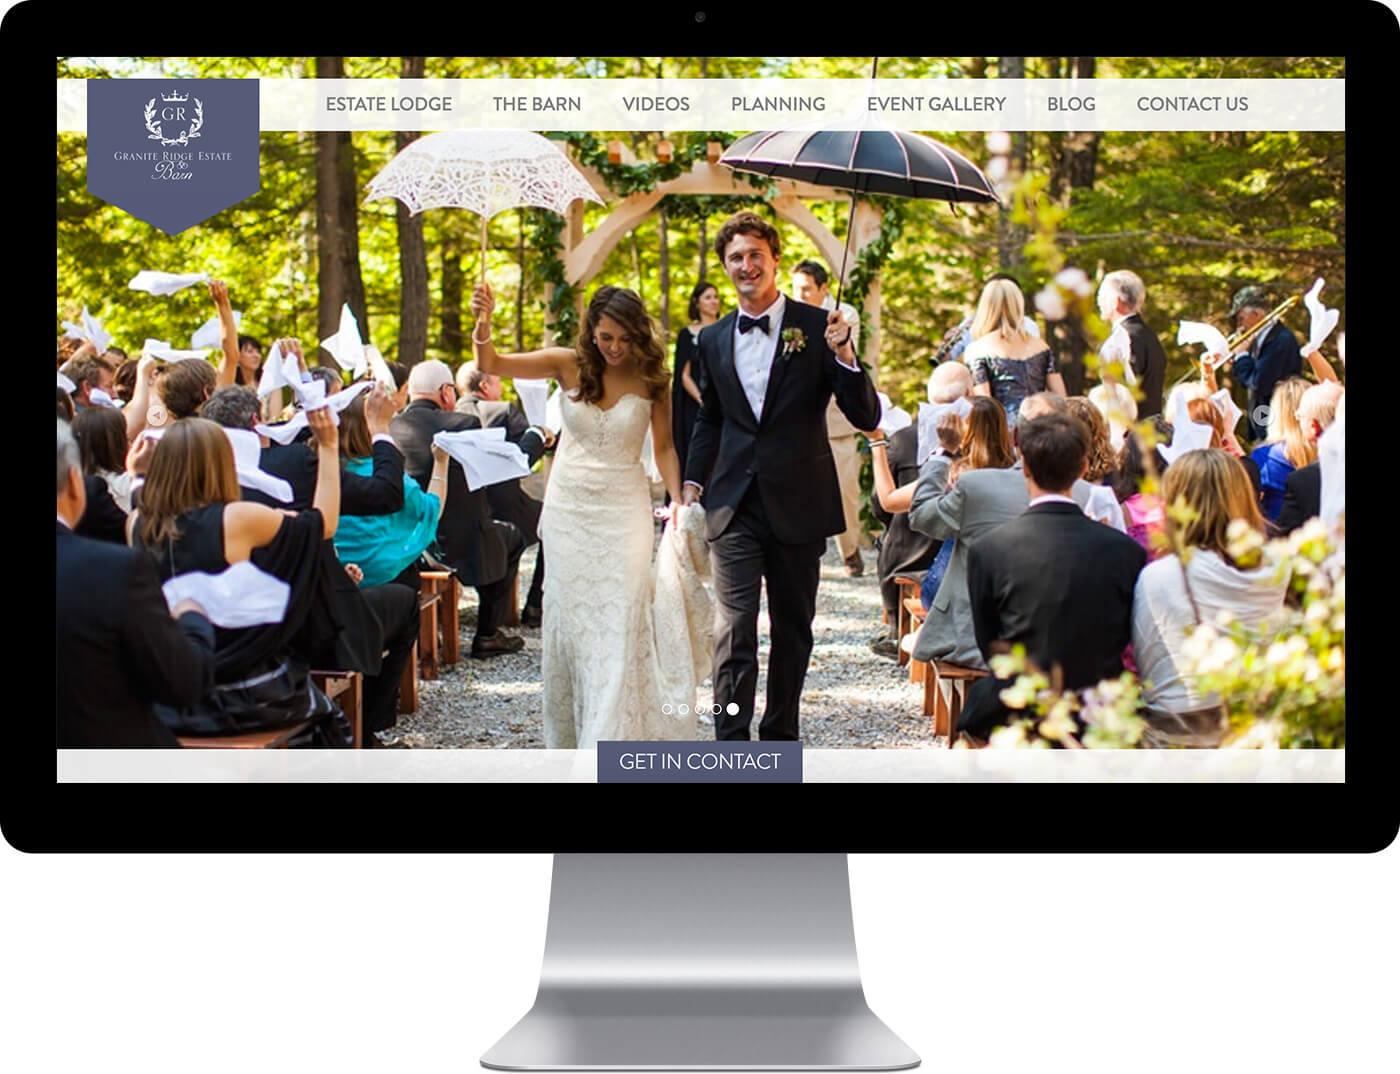 Granite Ridge Estate custom home page design example on a desktop monitor